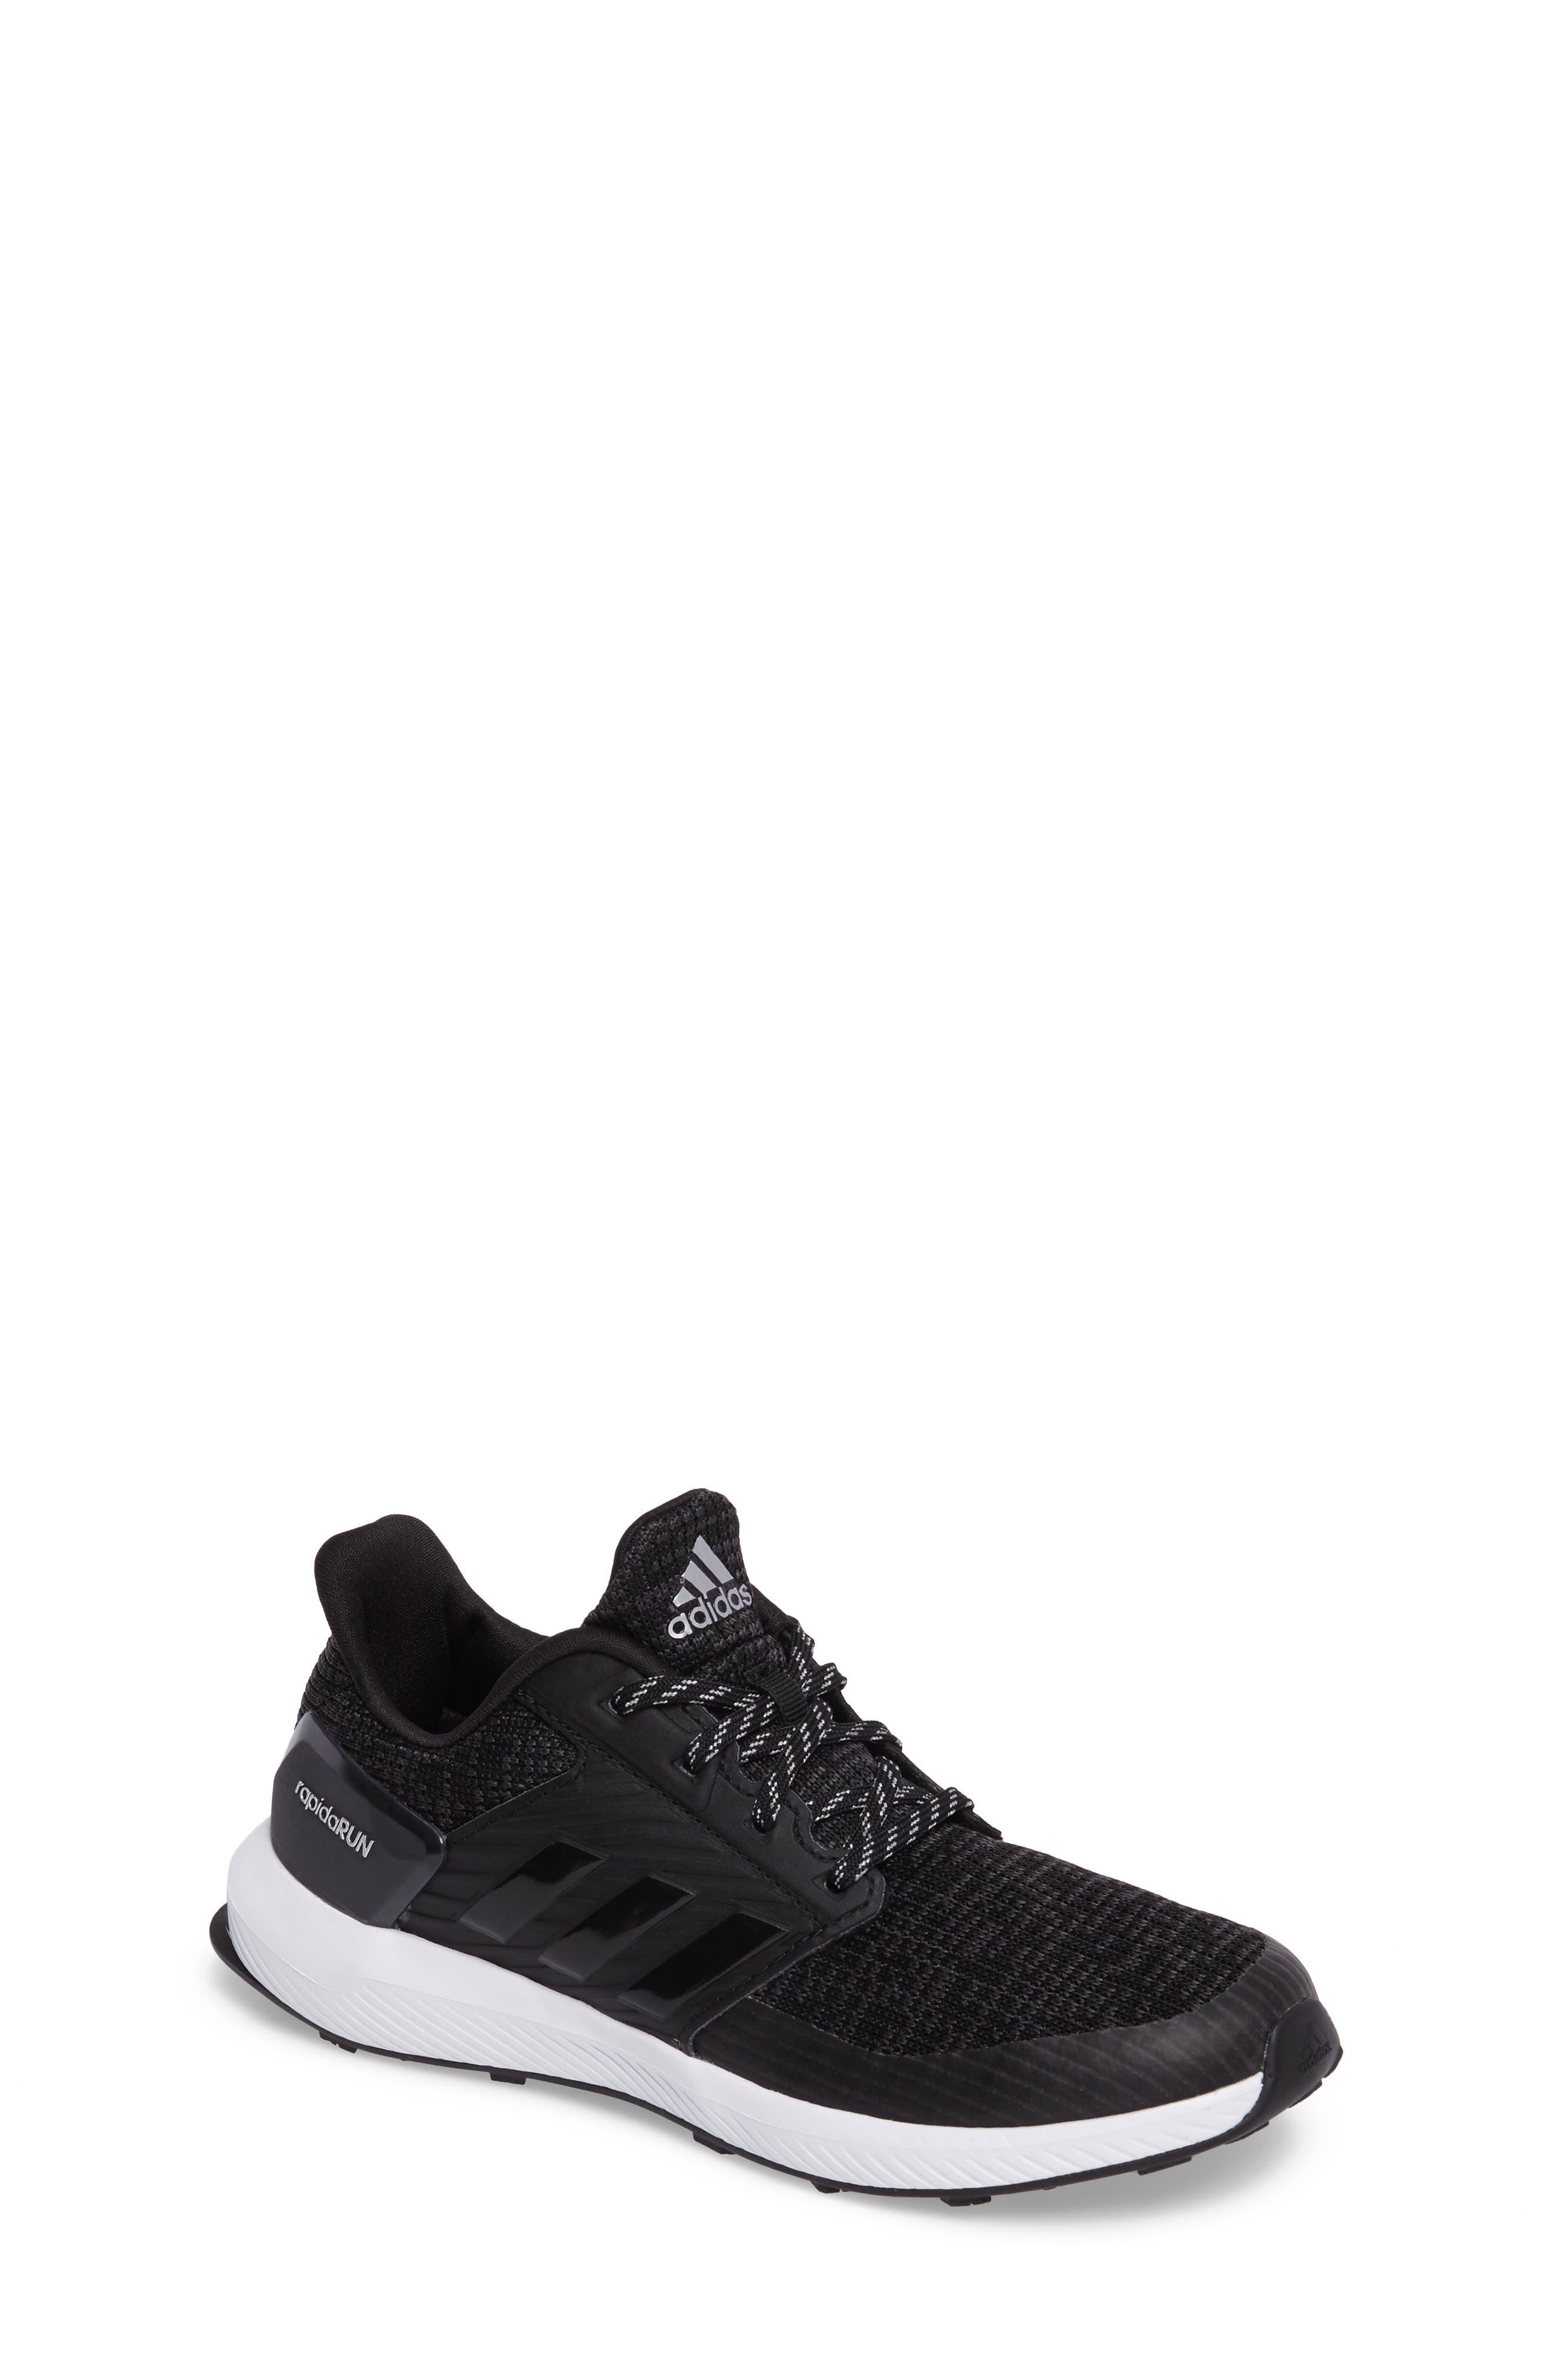 adidas RapidaRUN Lux Sneaker (Toddler & Little Kid)